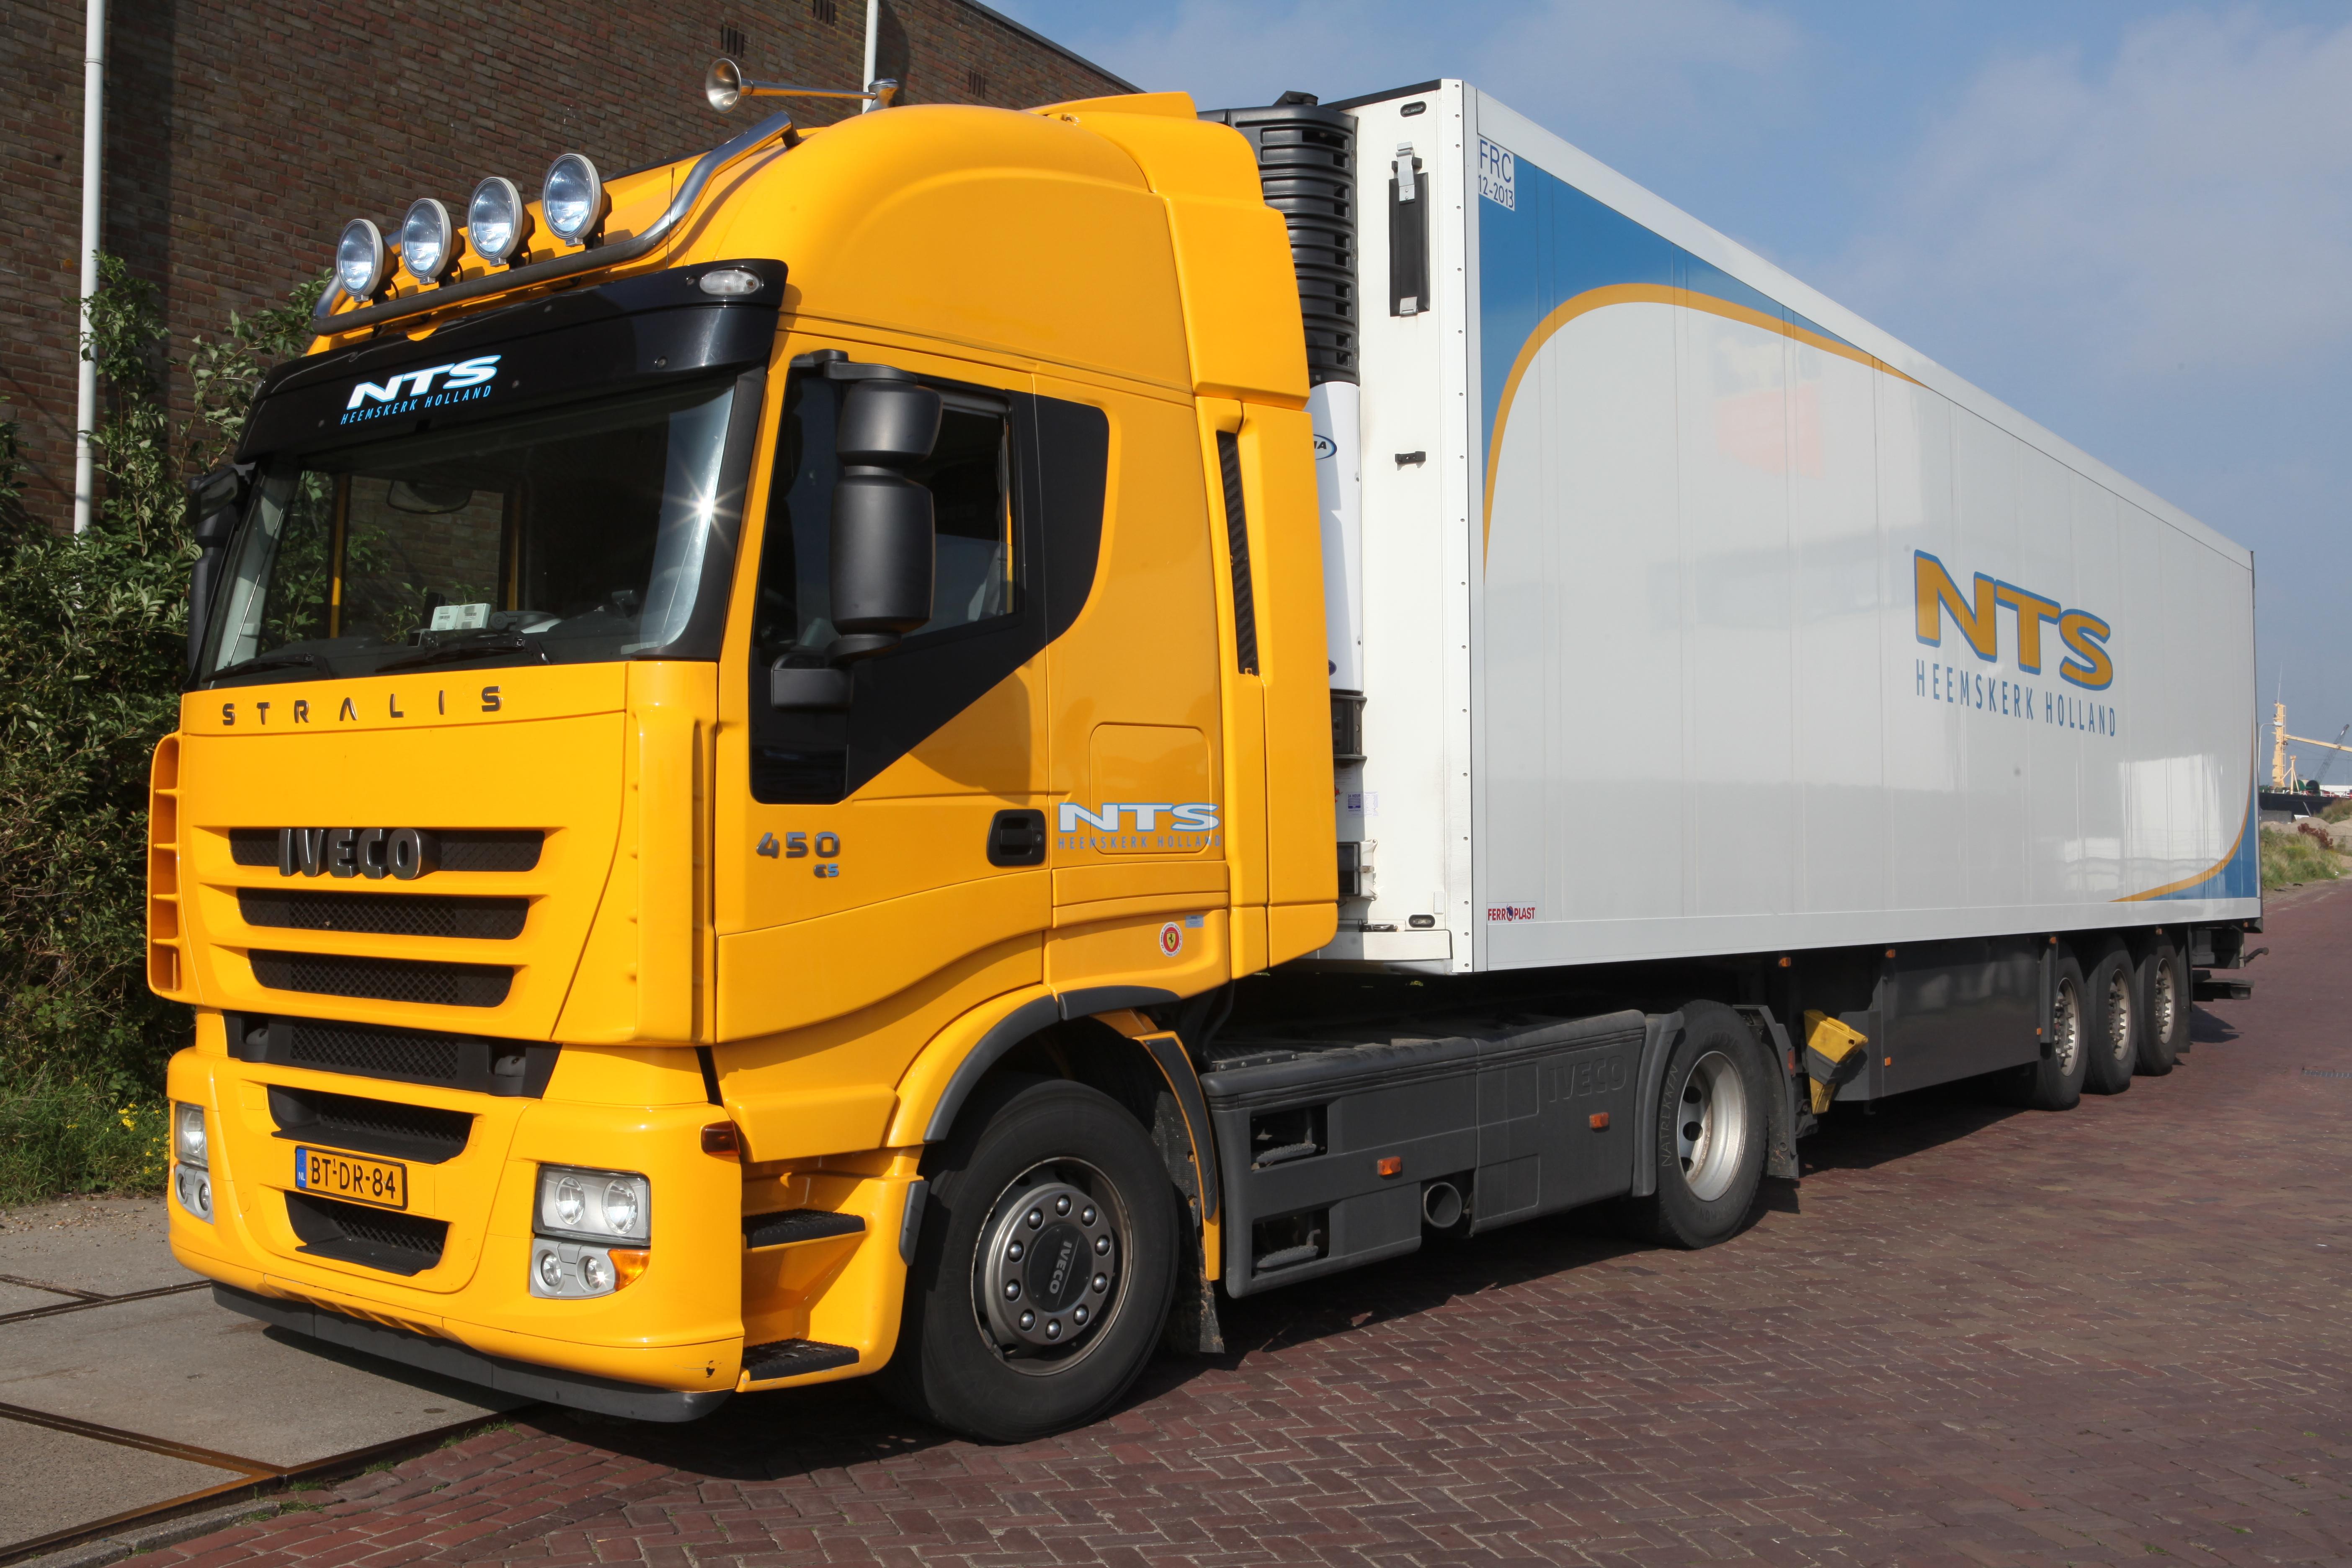 FileIVECO Stralis 450 E5 NTS Heemskerk Hollandjpg